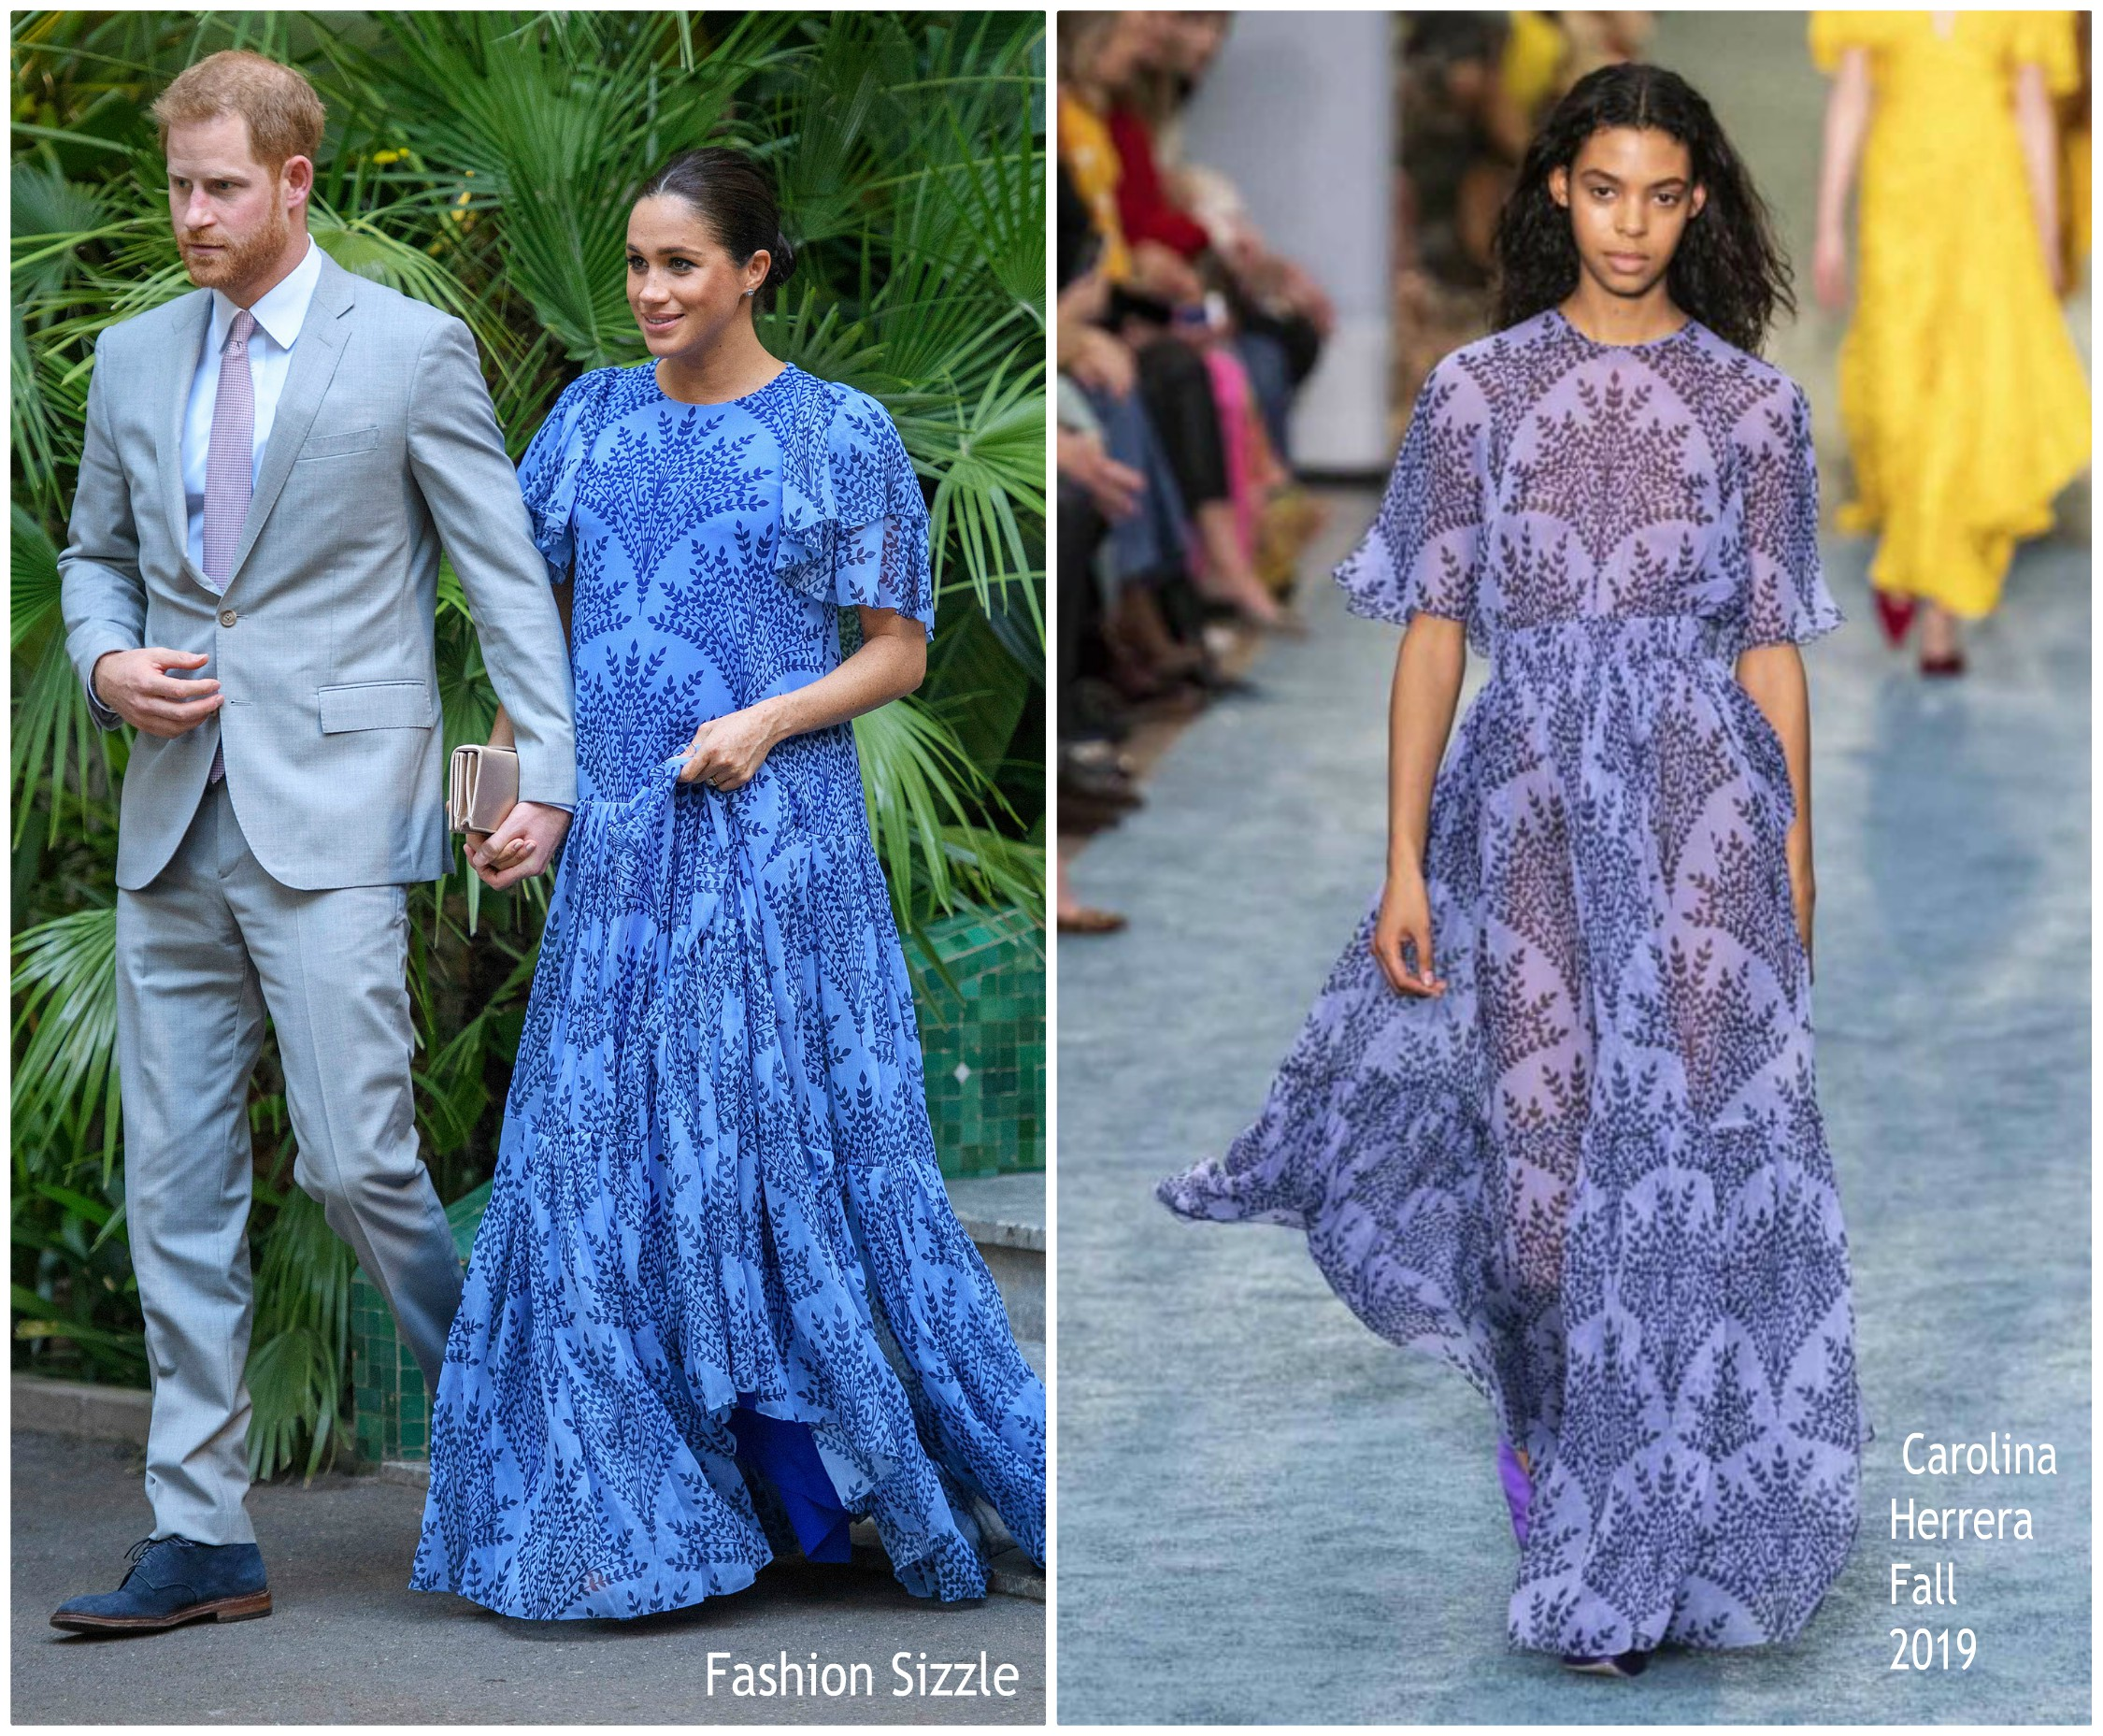 meghan-duchess-of-sussex-in-carolina-herrera-king-mohammed-V1-of-morocco-reception